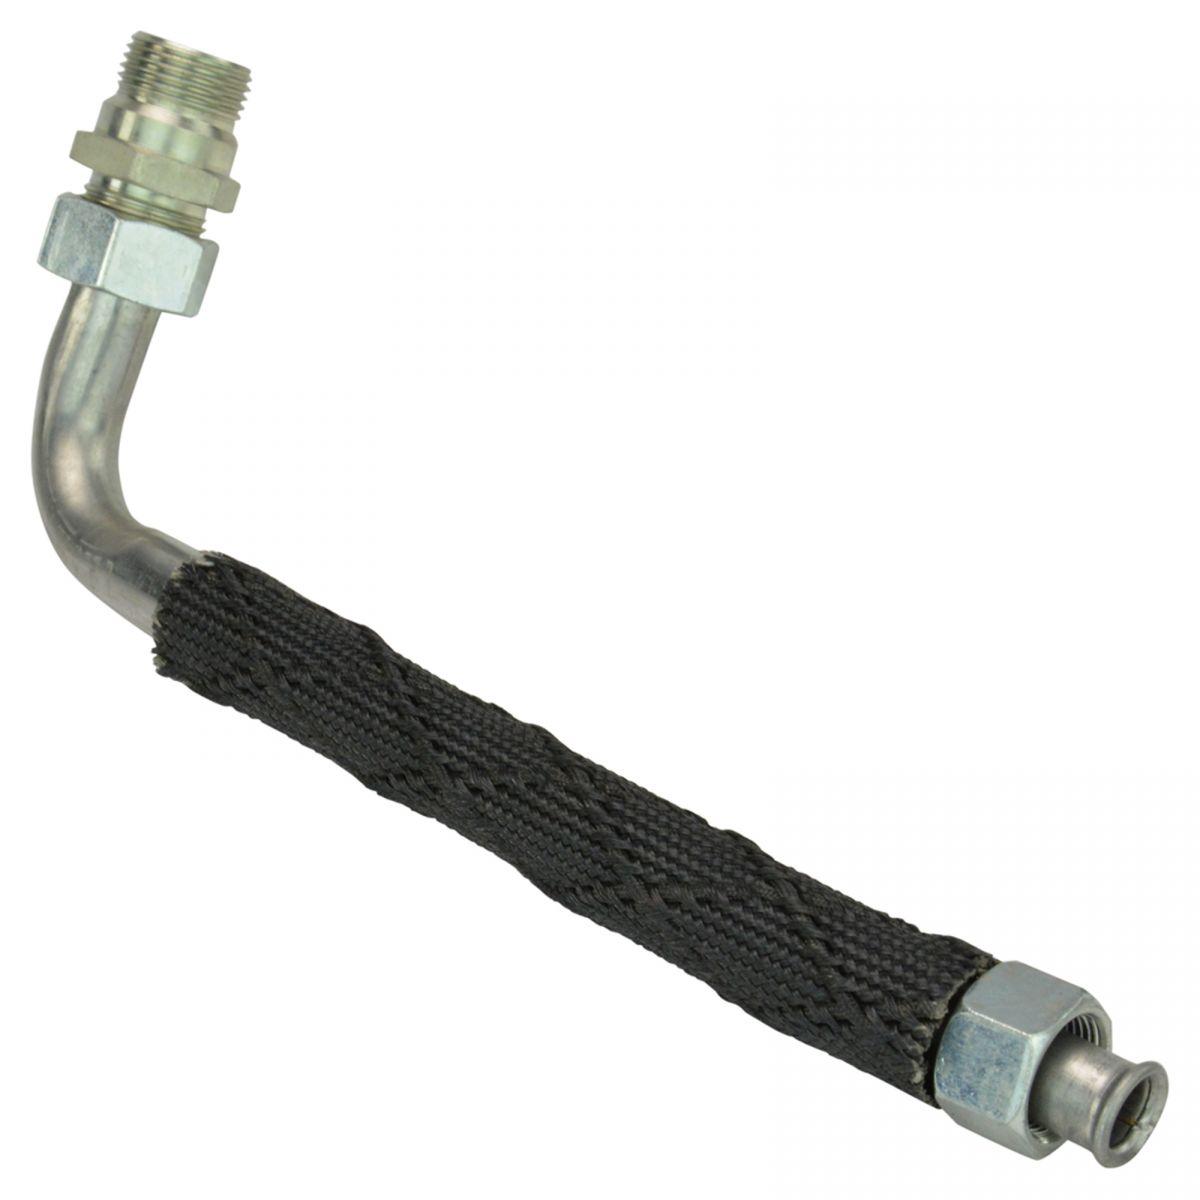 Emissions EGR Tube Pipe for Ford Bronco E150 E250 Van F150 F250 V8 5.0L